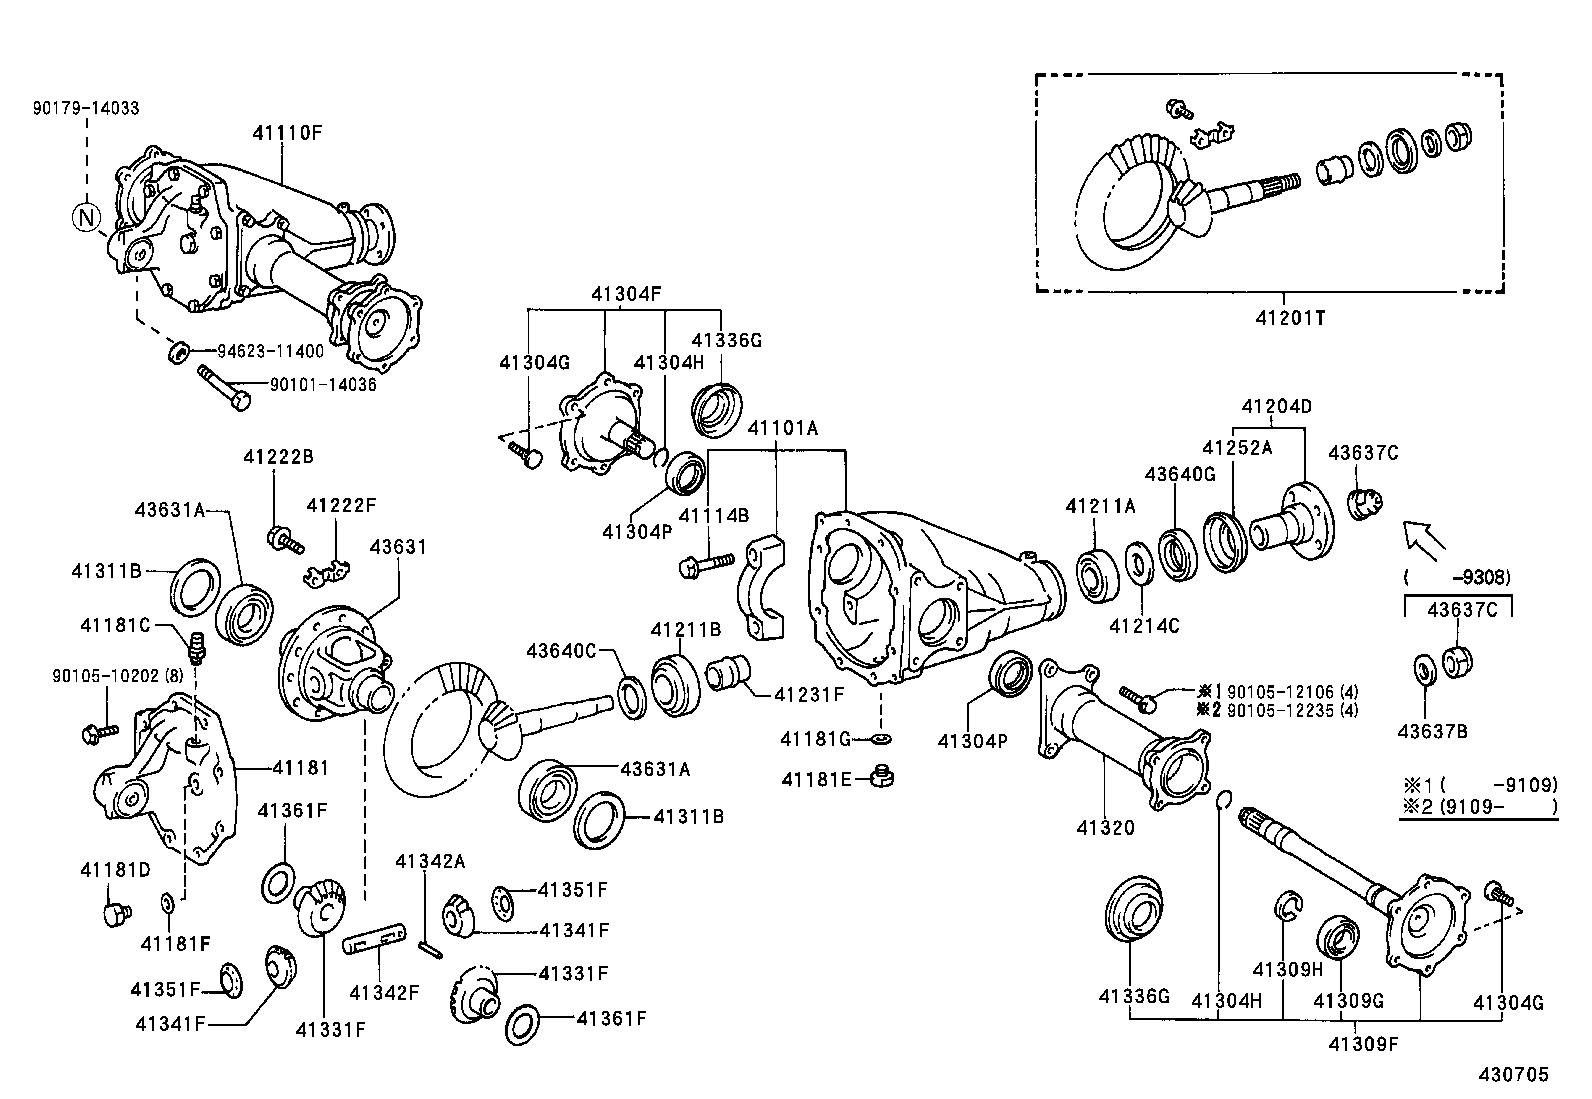 Download Toyota Previa Engine Diagram Full Quality